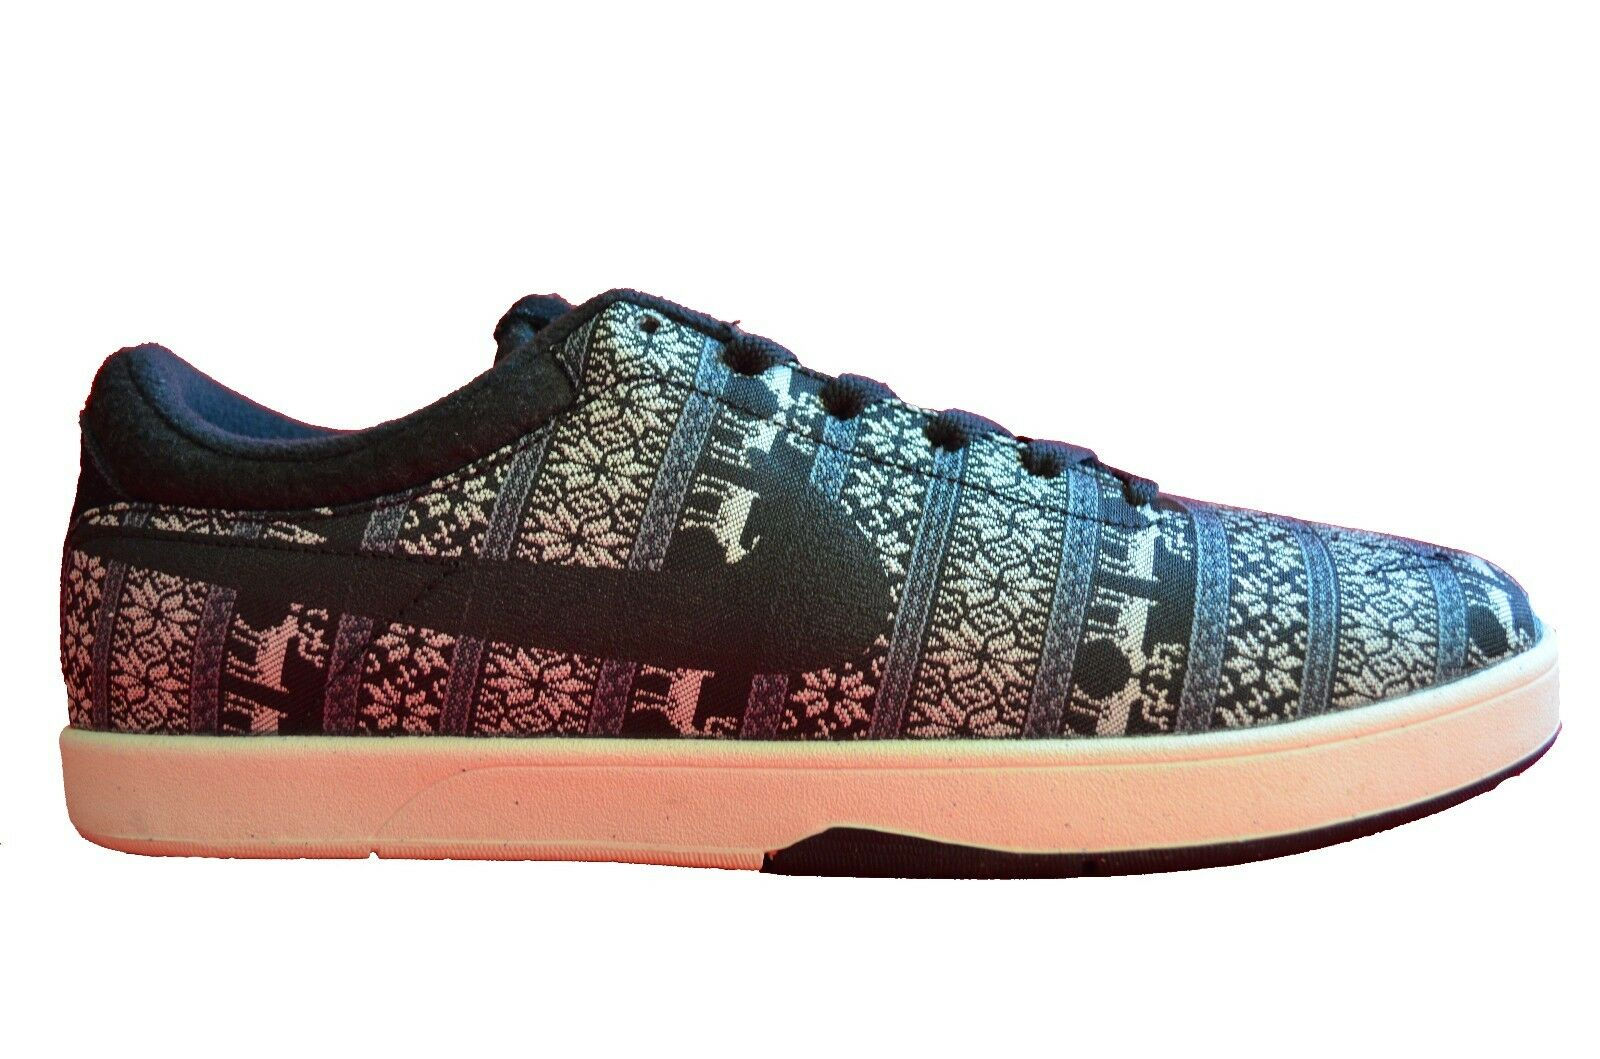 Cheap women's shoes women's shoes Nike SB Eric Koston Warmth Black Grey White Skateboarding Shoes 685189-003